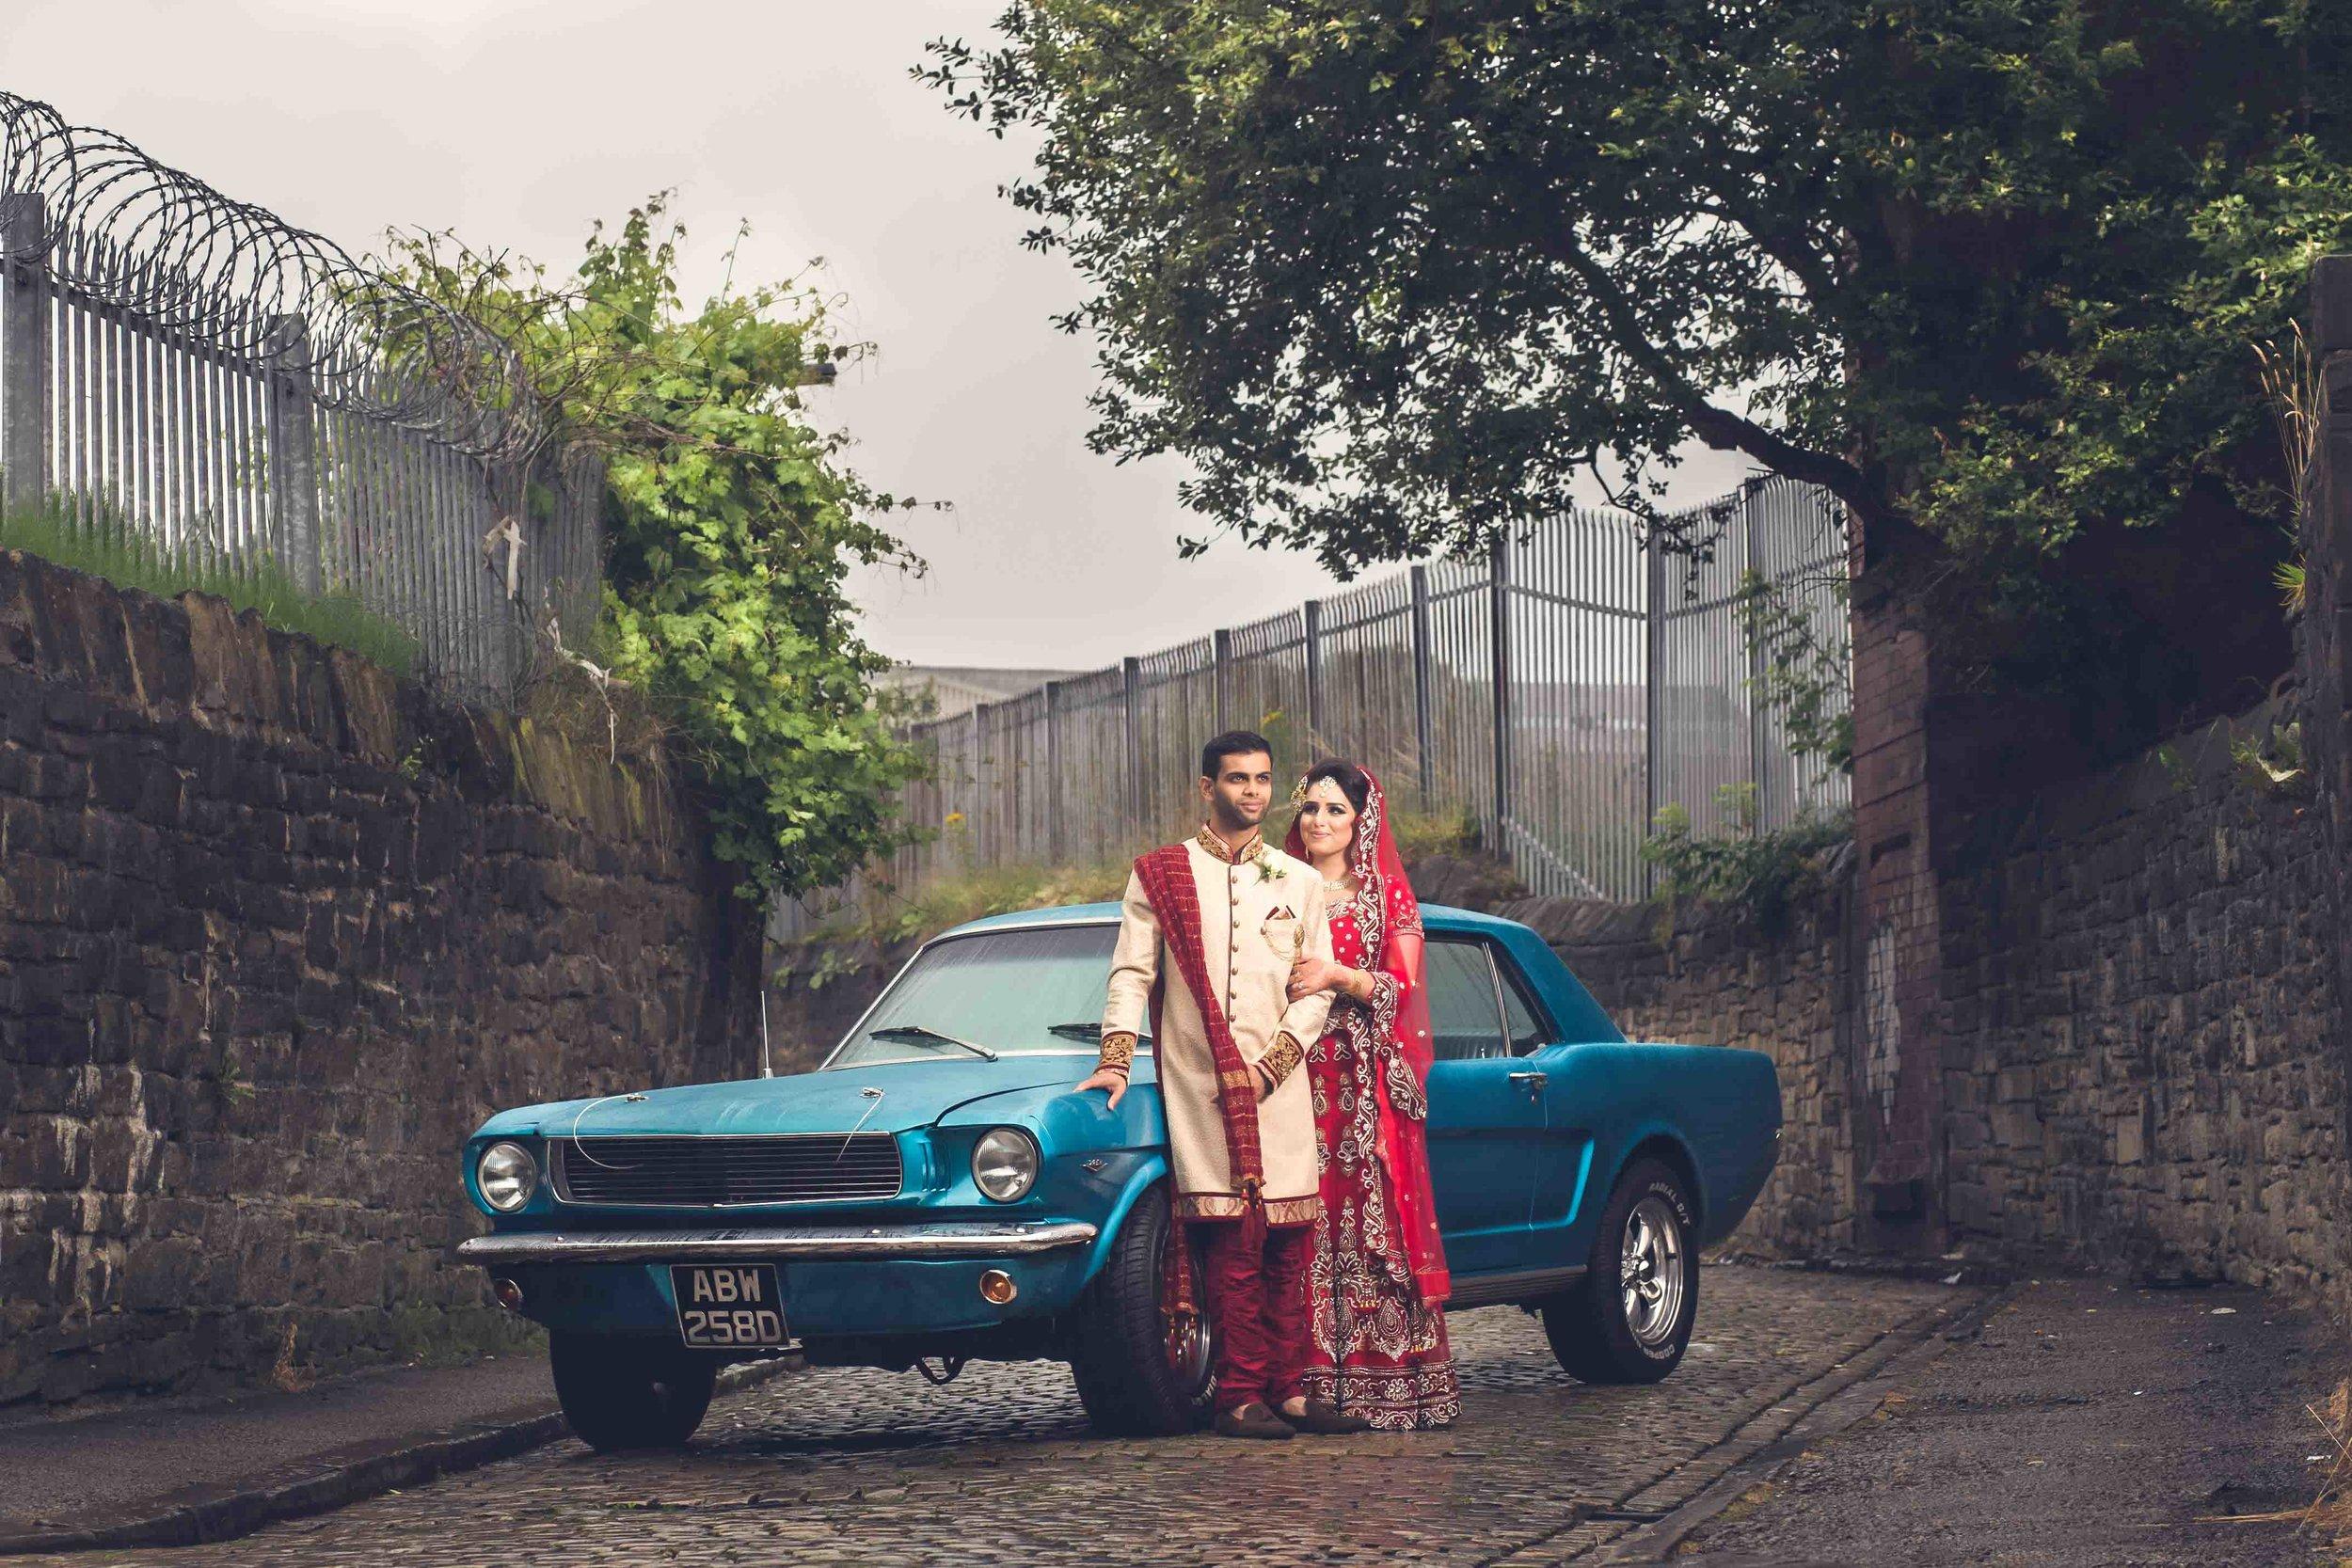 Asian Wedding Photographer Opu Sultan Photography Lyme Park Scotland Edinburgh Glasgow London Manchester Liverpool Birmingham Wedding Photos prewed shoot Jams & Tams Blod-83.jpg